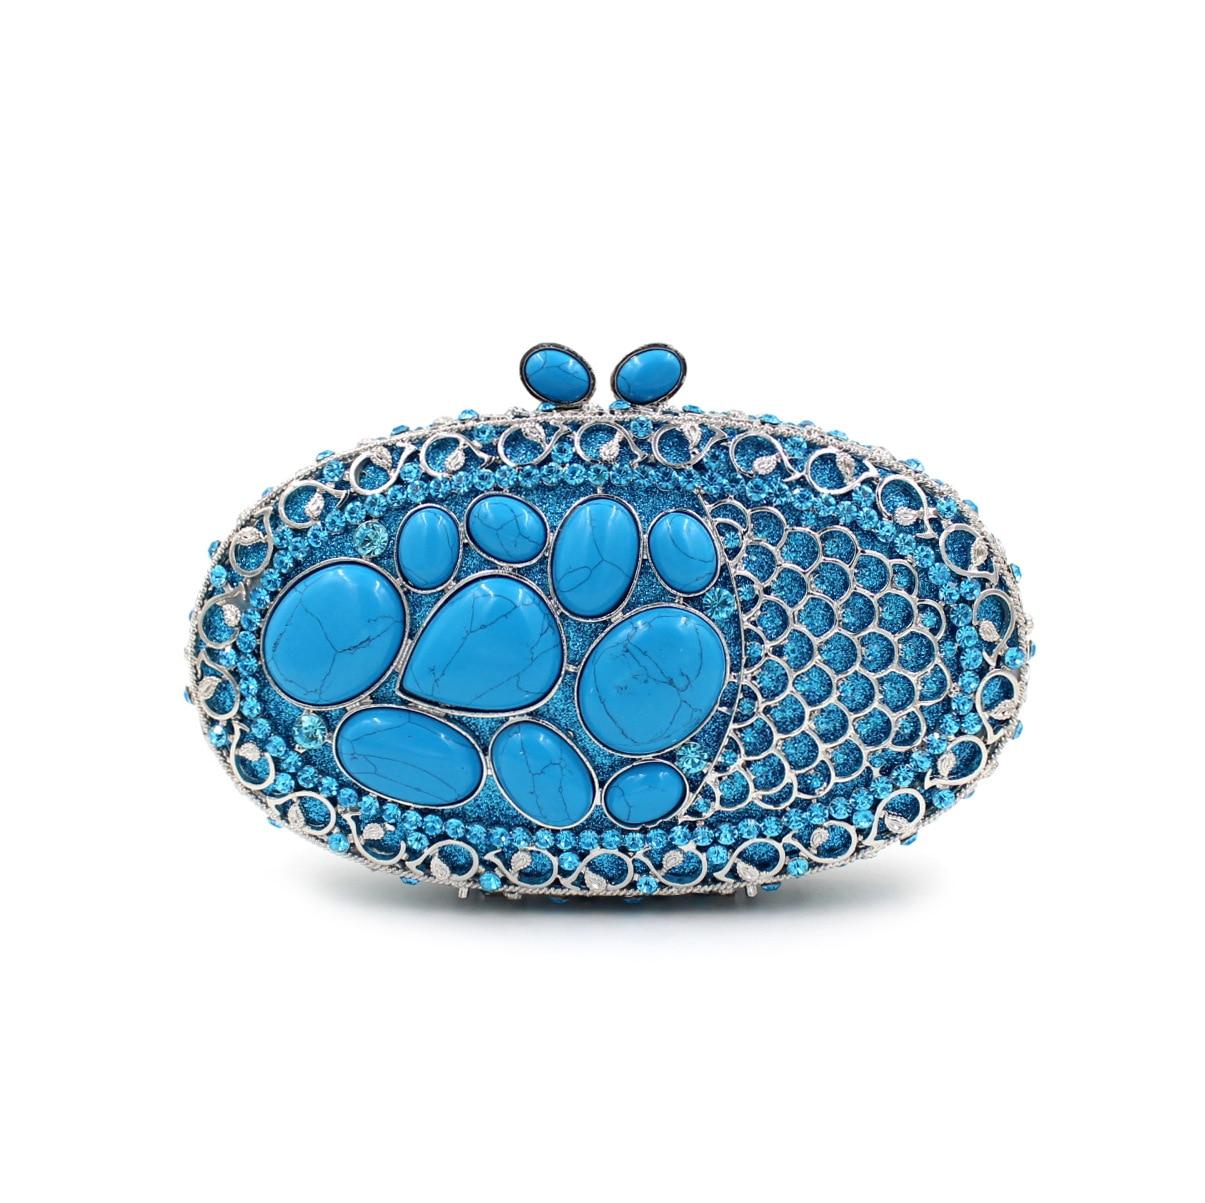 2017 new women bag European luxury sapphire crystal diamond bag handbags purses ladies single shoulder handbag evening bags sac luxury crystal clutch handbag women evening bag wedding party purses banquet